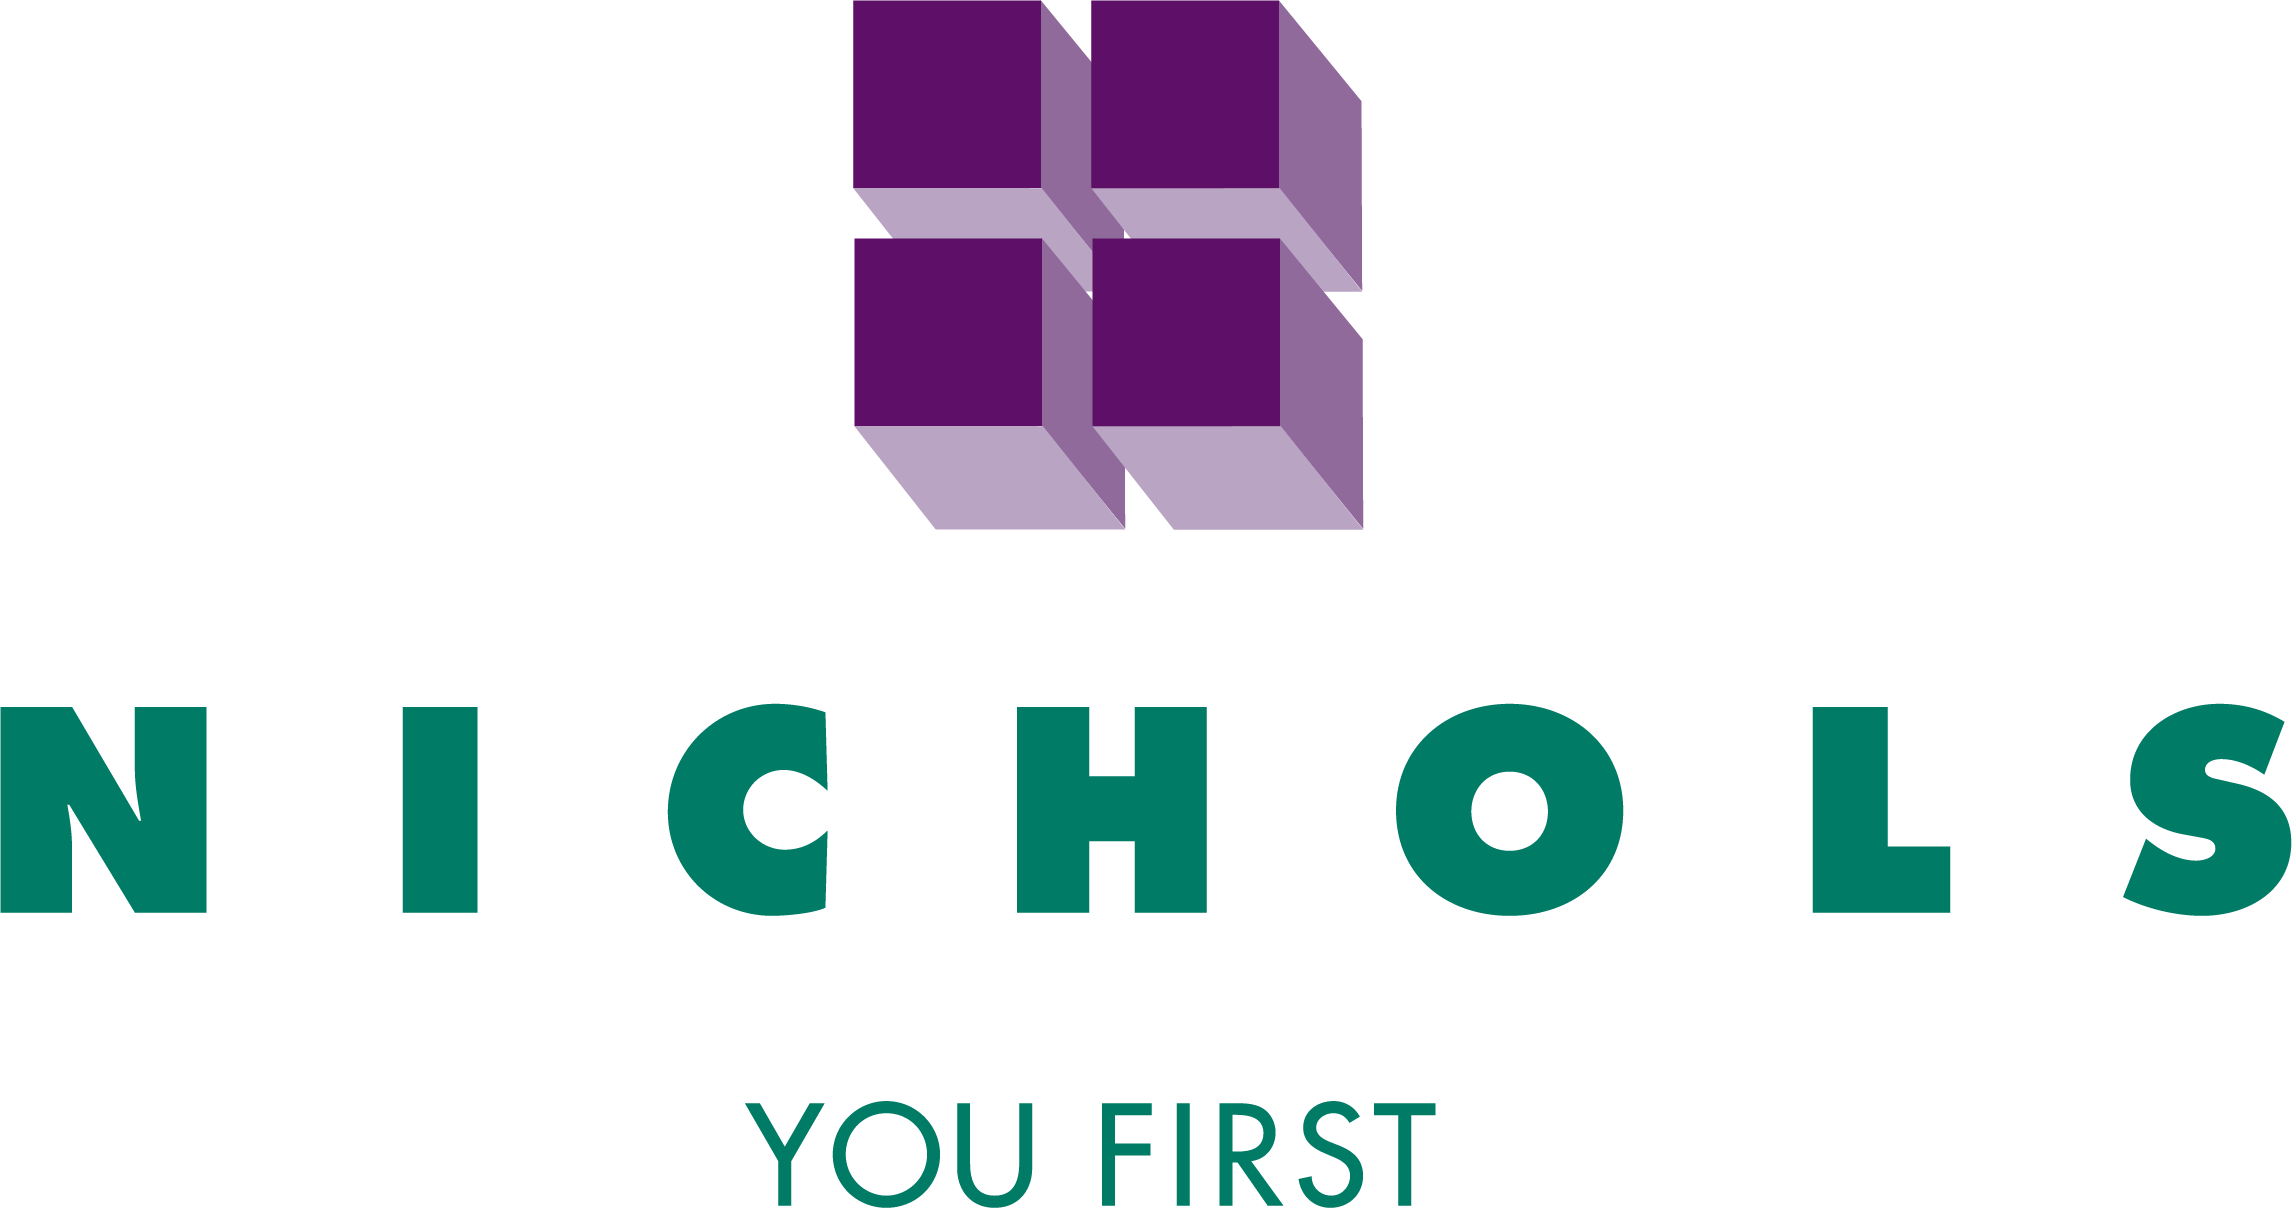 nichols_logo-You First_PMS (1).png